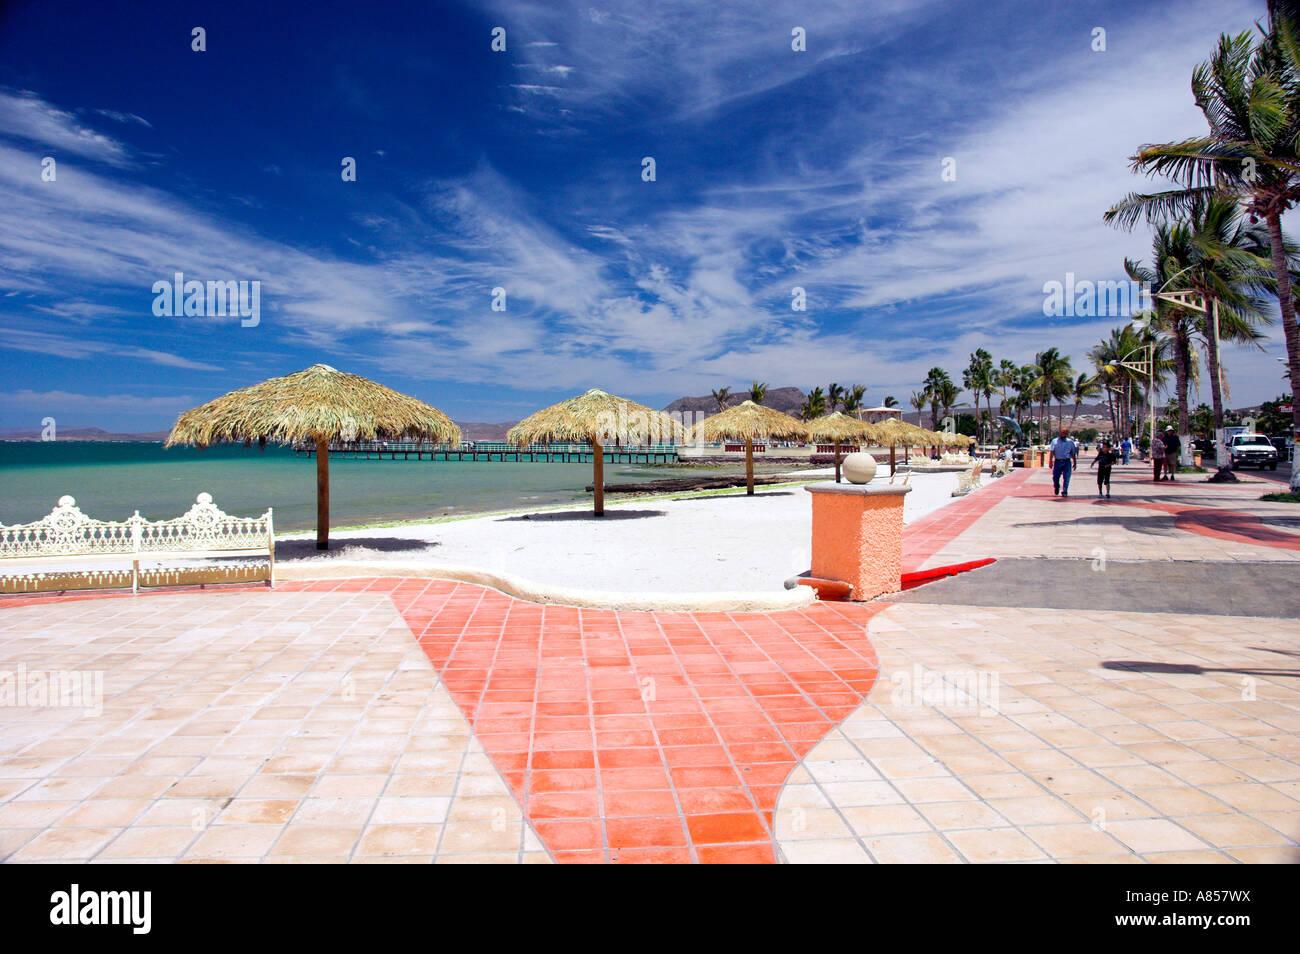 Coastal Sea of Cortez views along the malecon at La Paz Mexico - Stock Image